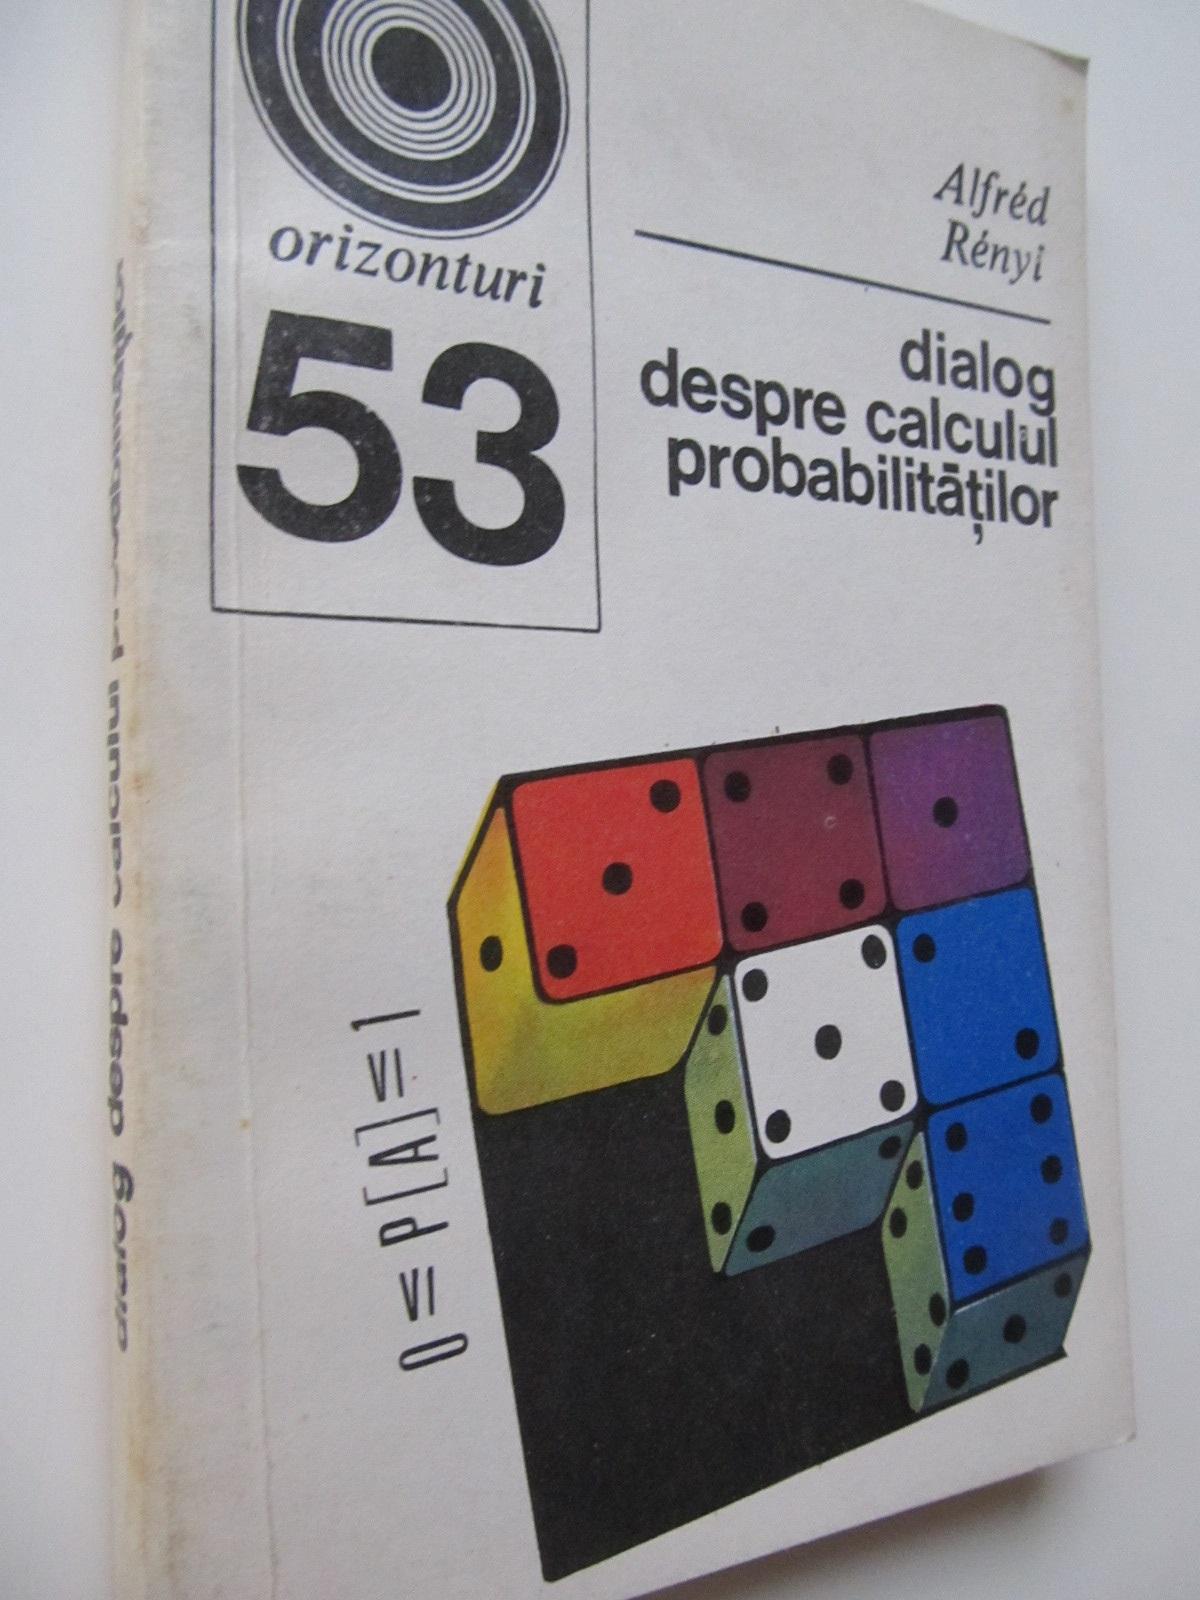 Dialog despre calculul probabilitatilor (53) - Alfred Renyi | Detalii carte